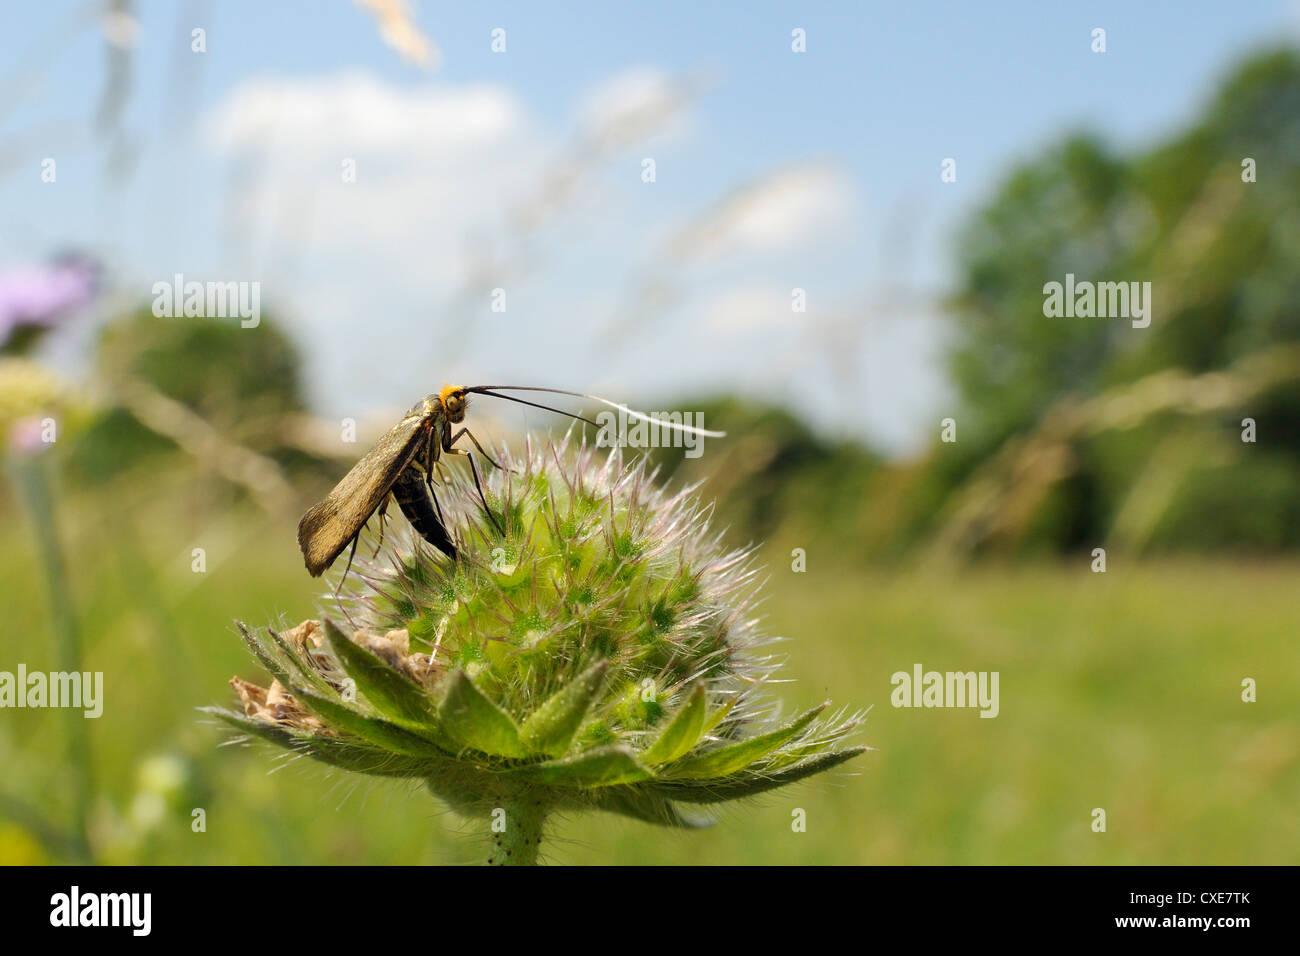 Female longhorn moth (Nemophora metallica), laying eggs in field scabious (Knautia arvensis) seedhead, UK - Stock Image